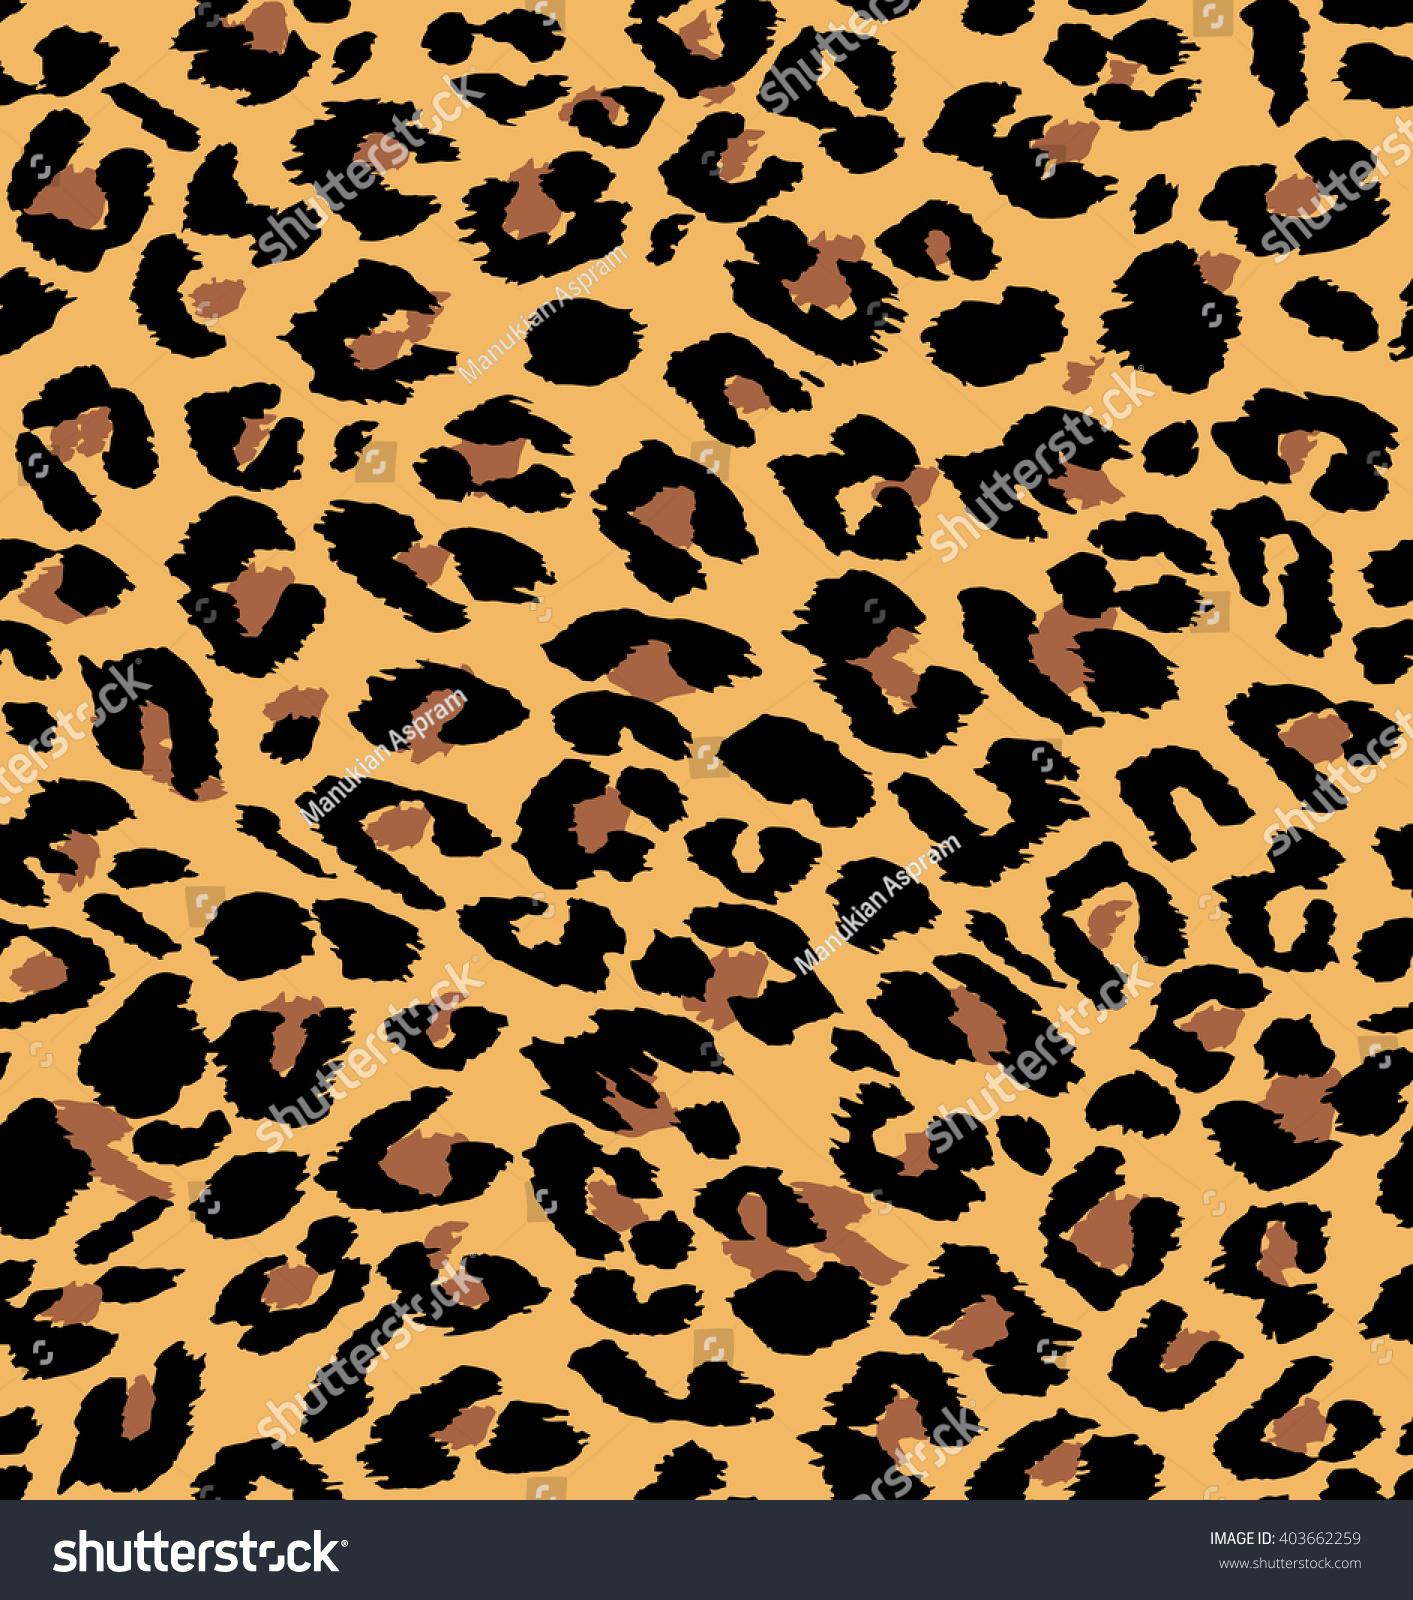 animal print seamless pattern - photo #9